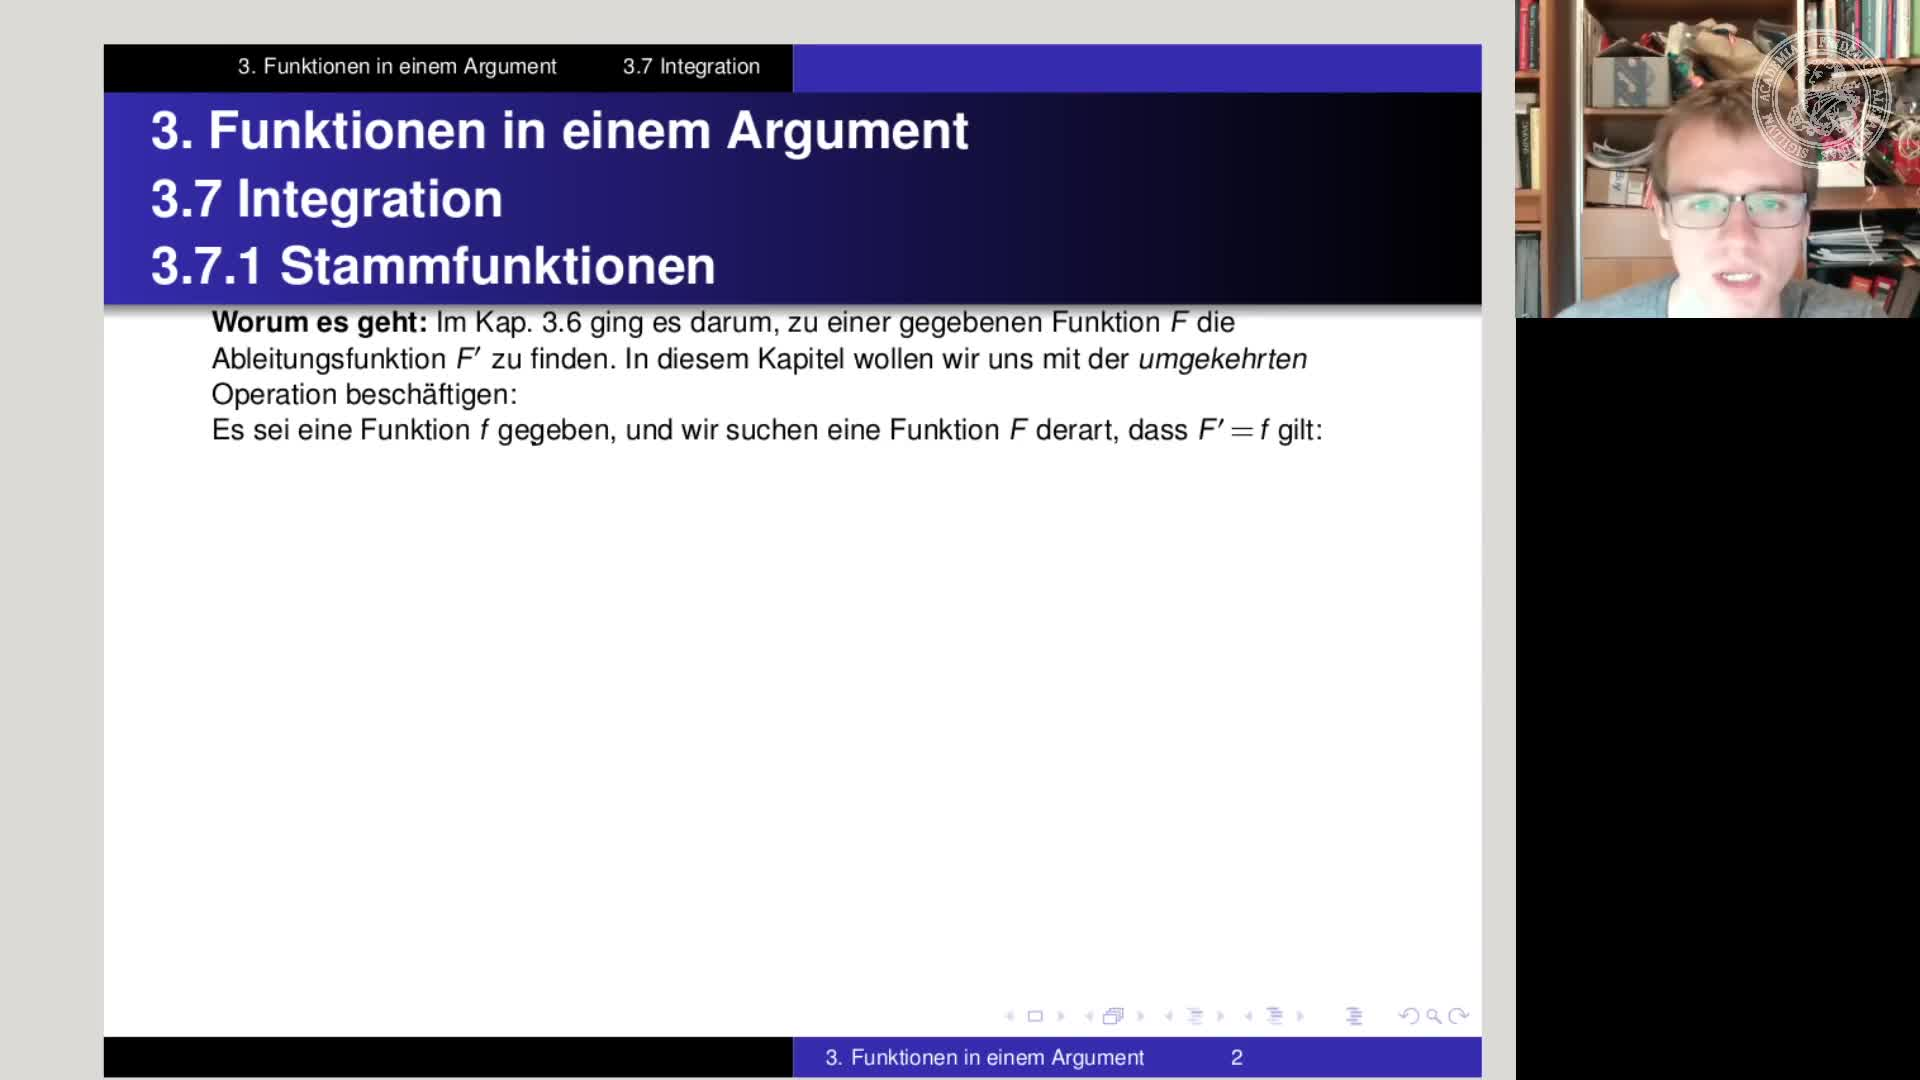 VL_09_1_Stammfunktion preview image